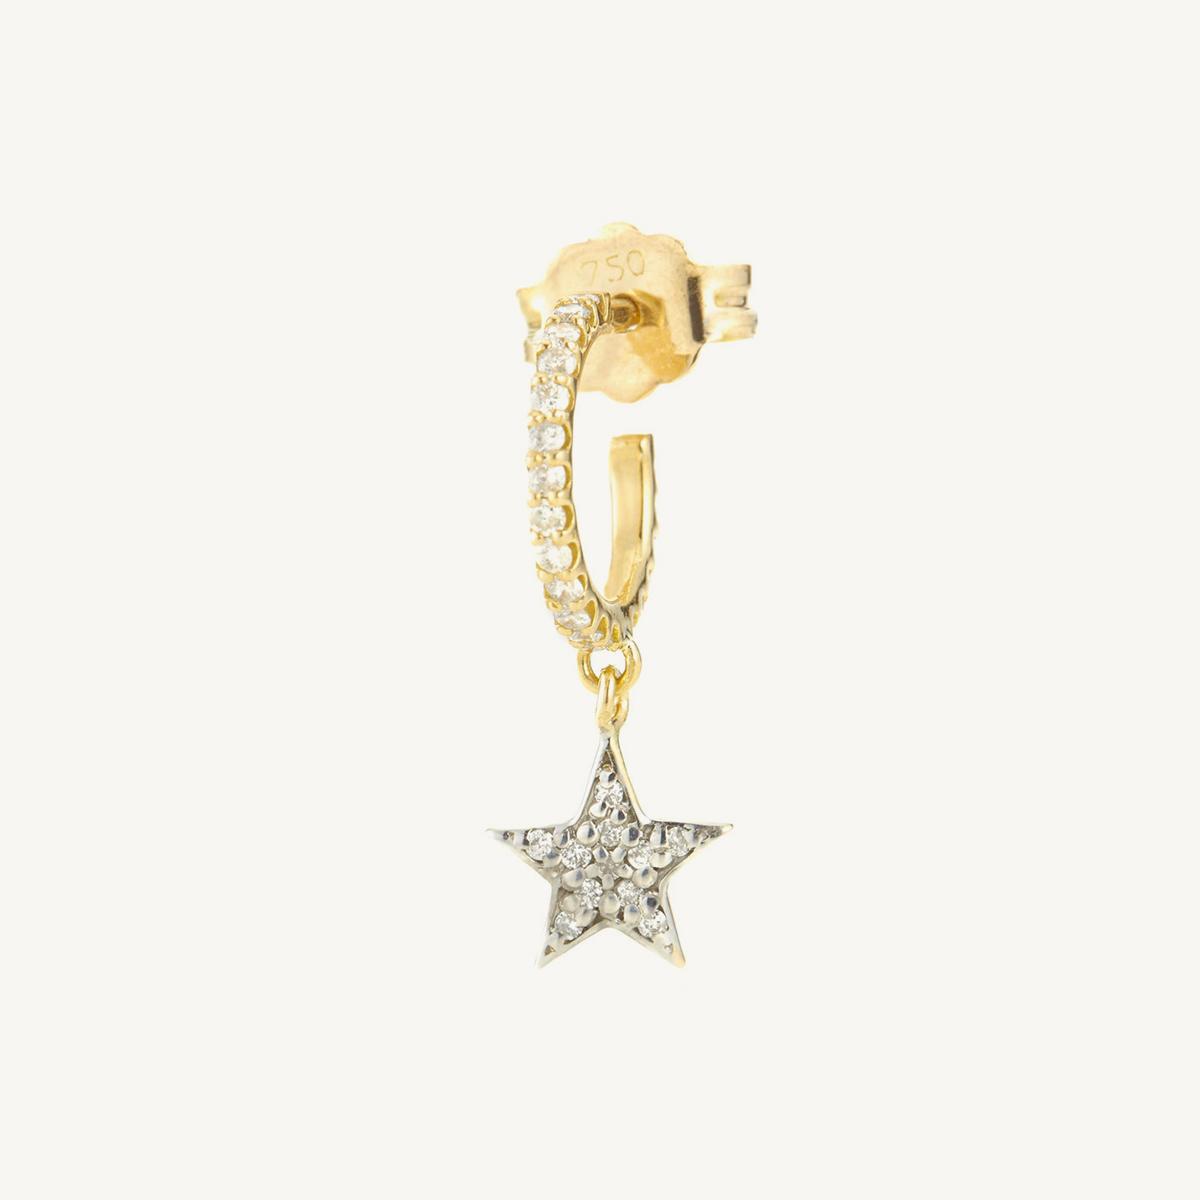 Earring Star Mini Hoop in yellow gold